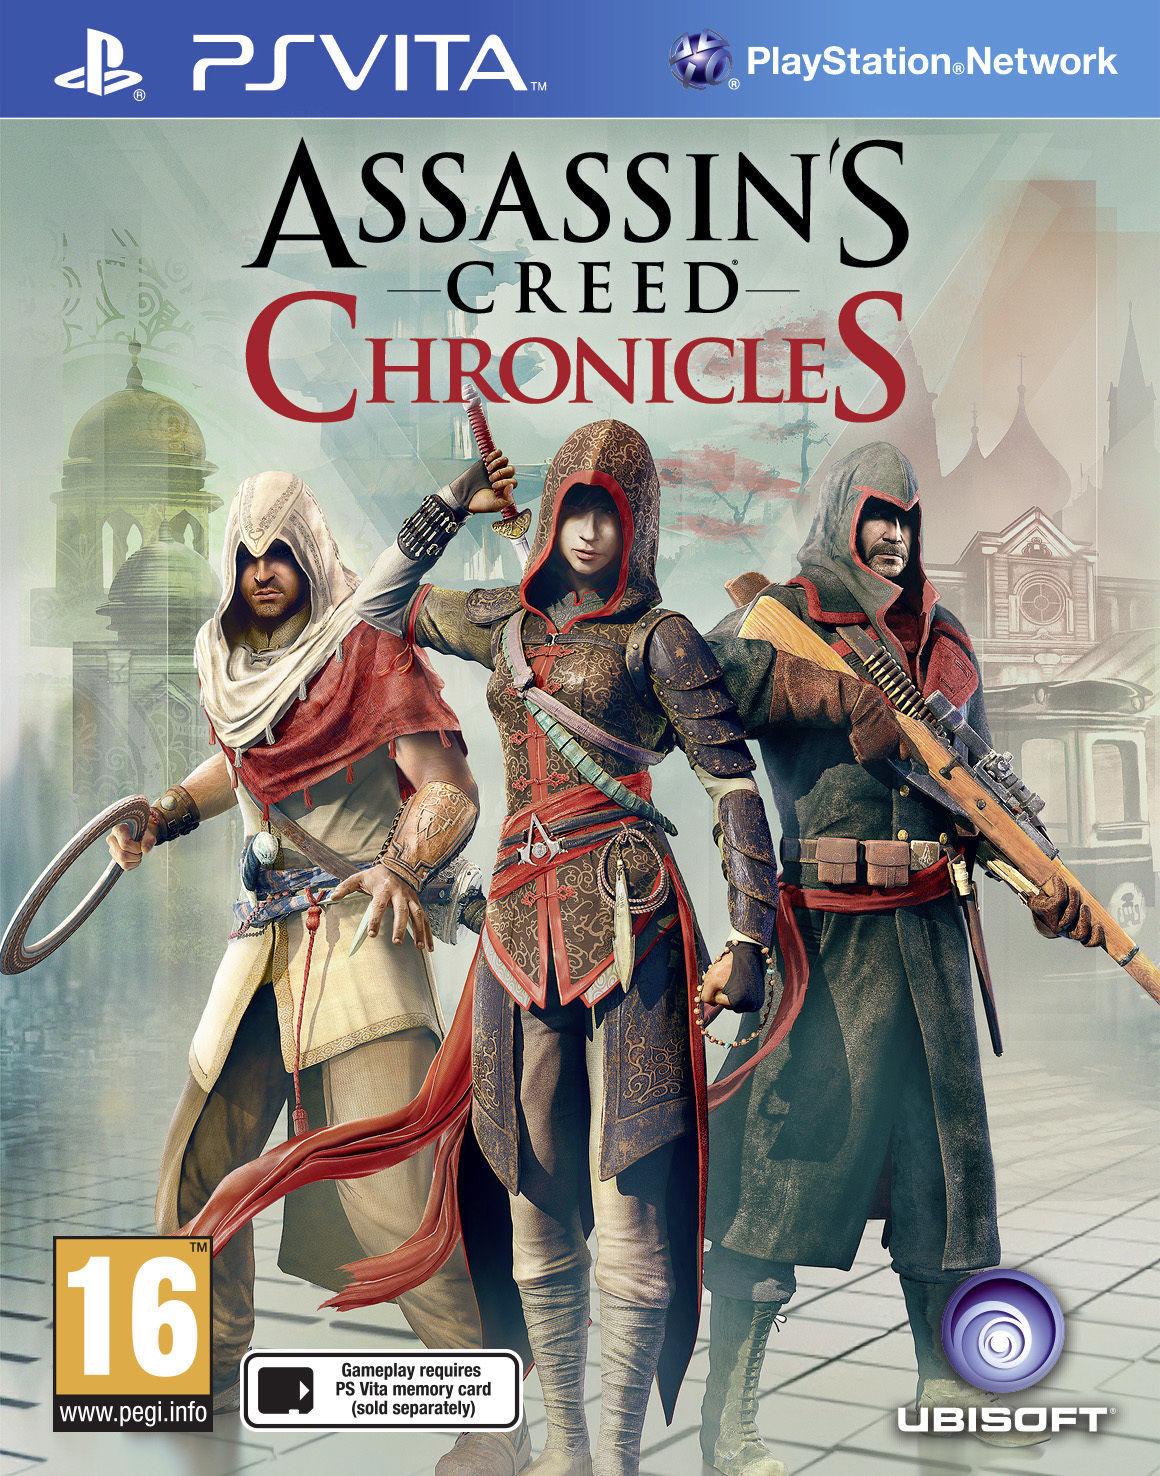 Resultado de imagen de Videojuego Assassins Creed Chronicles para PS Vita